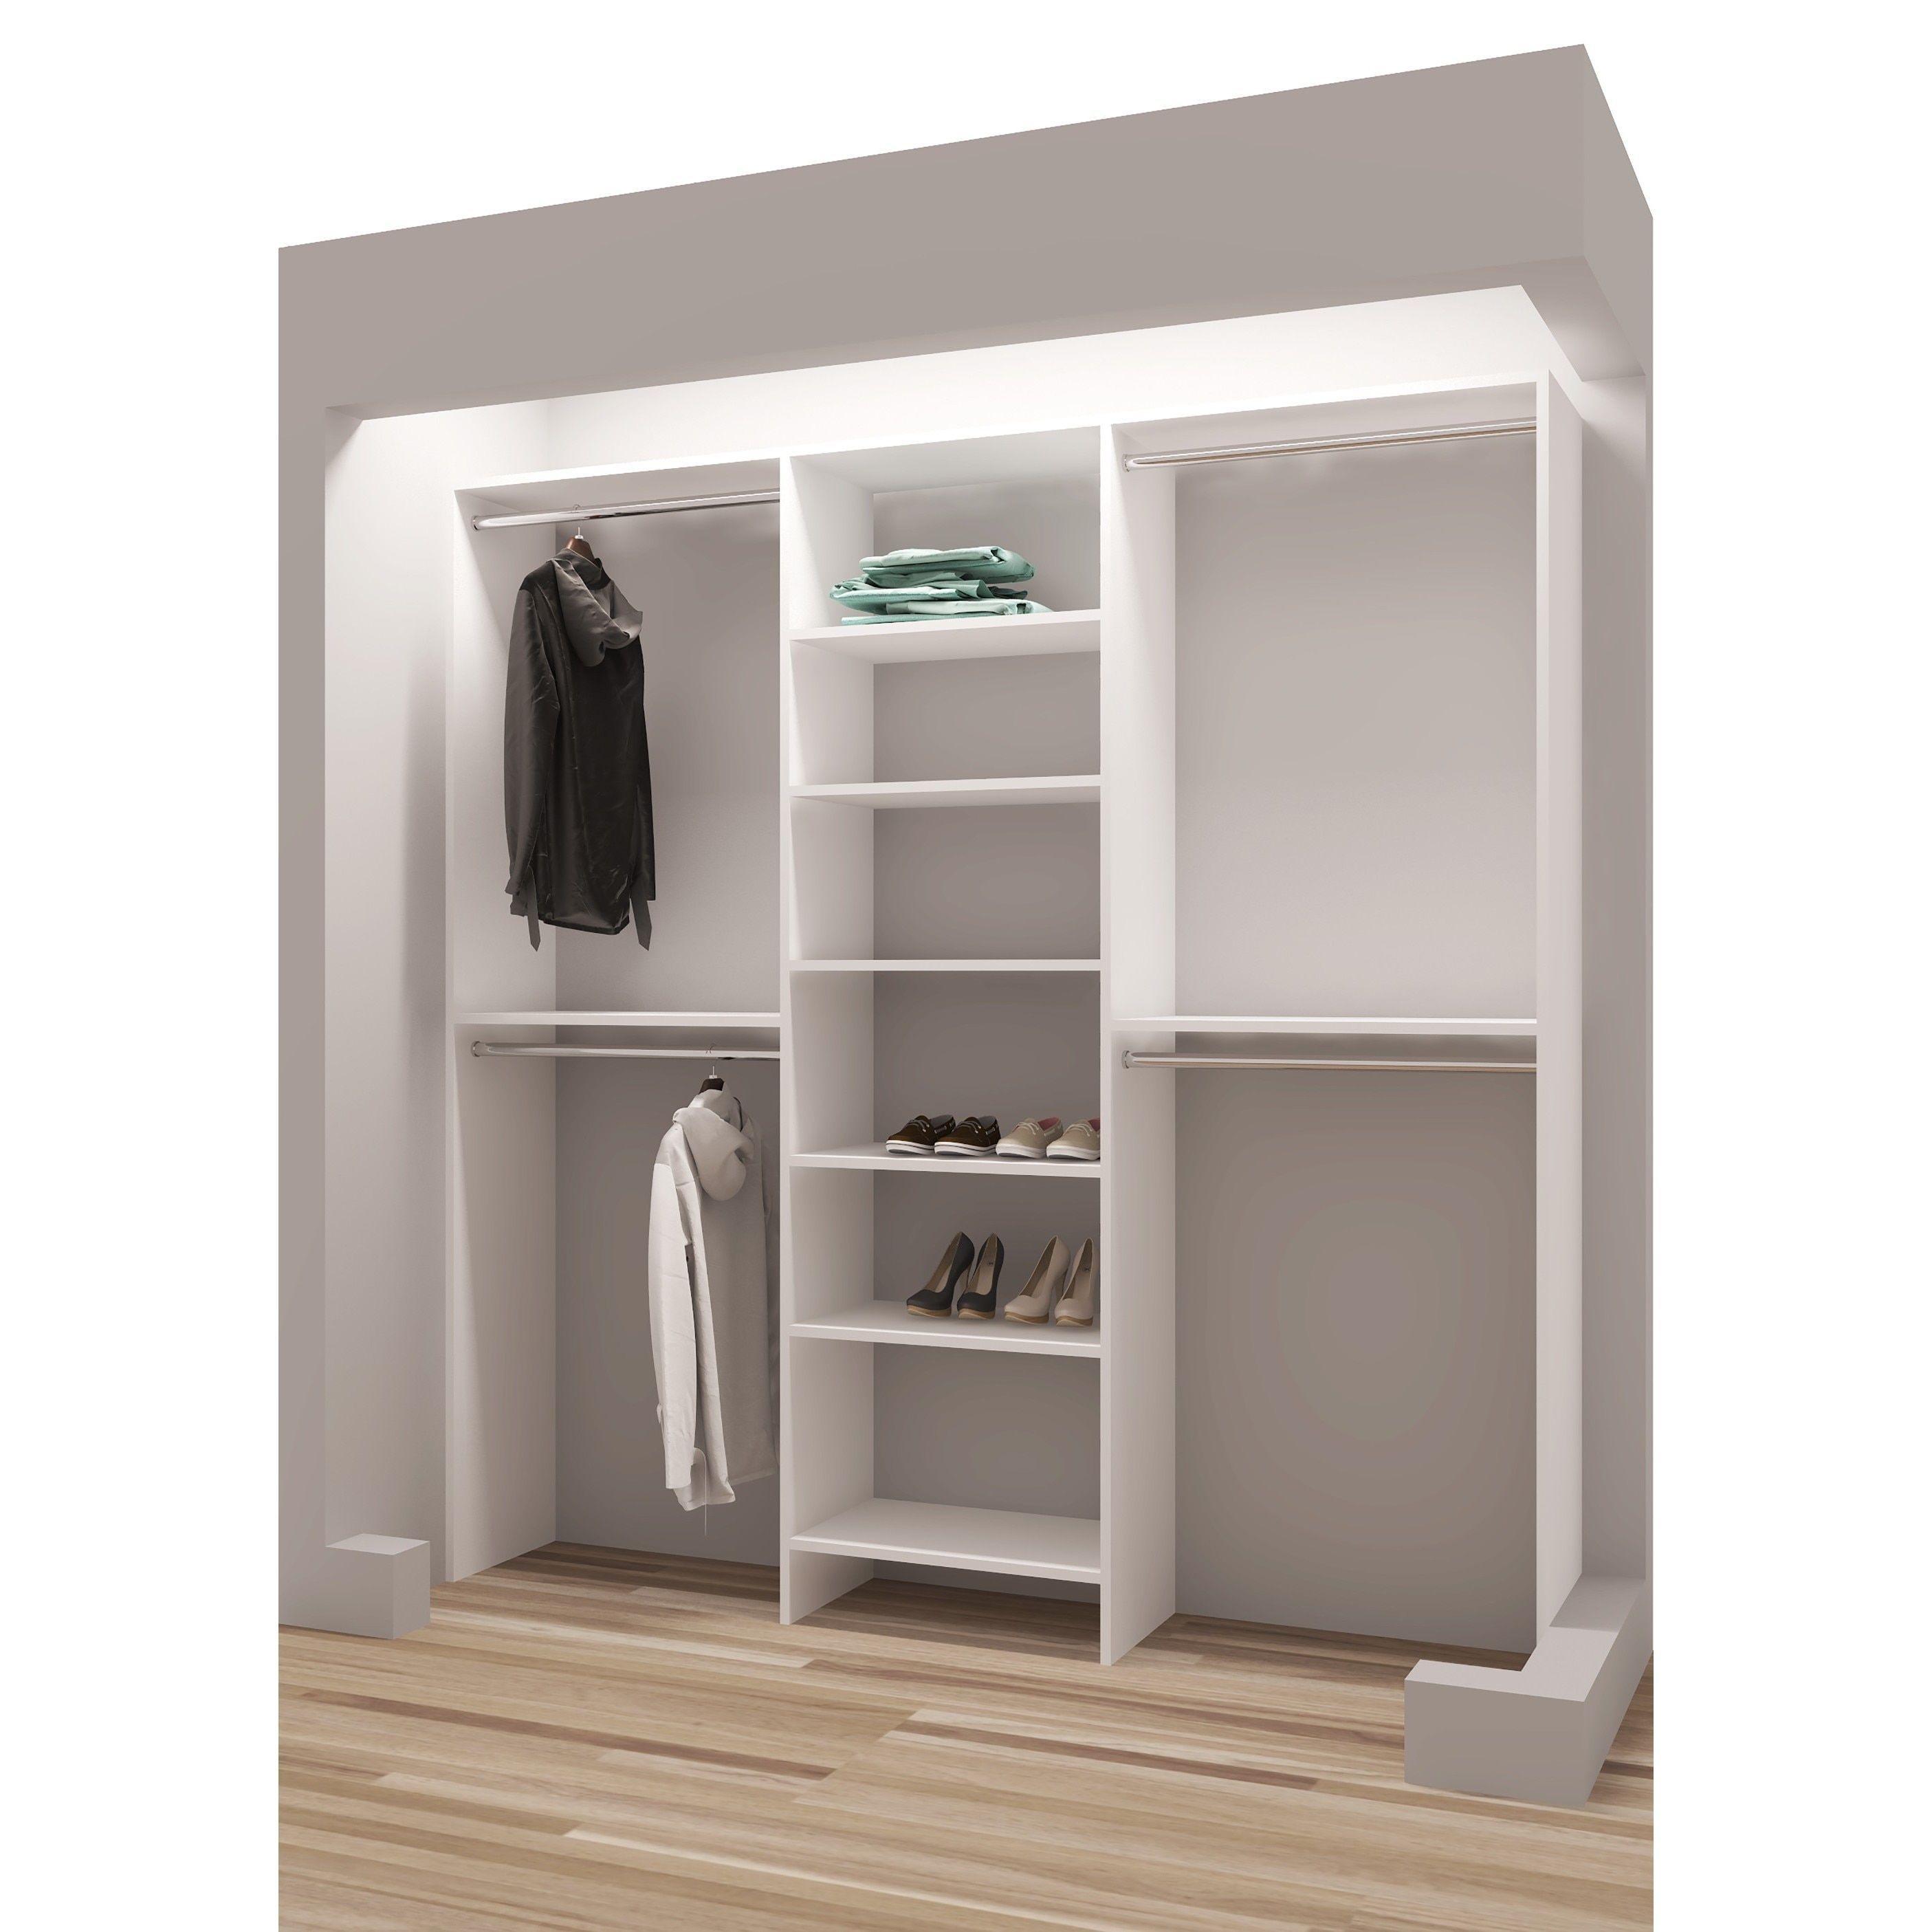 Tidysquares White Wood 81 Inch Reach In Closet Organizer Closet